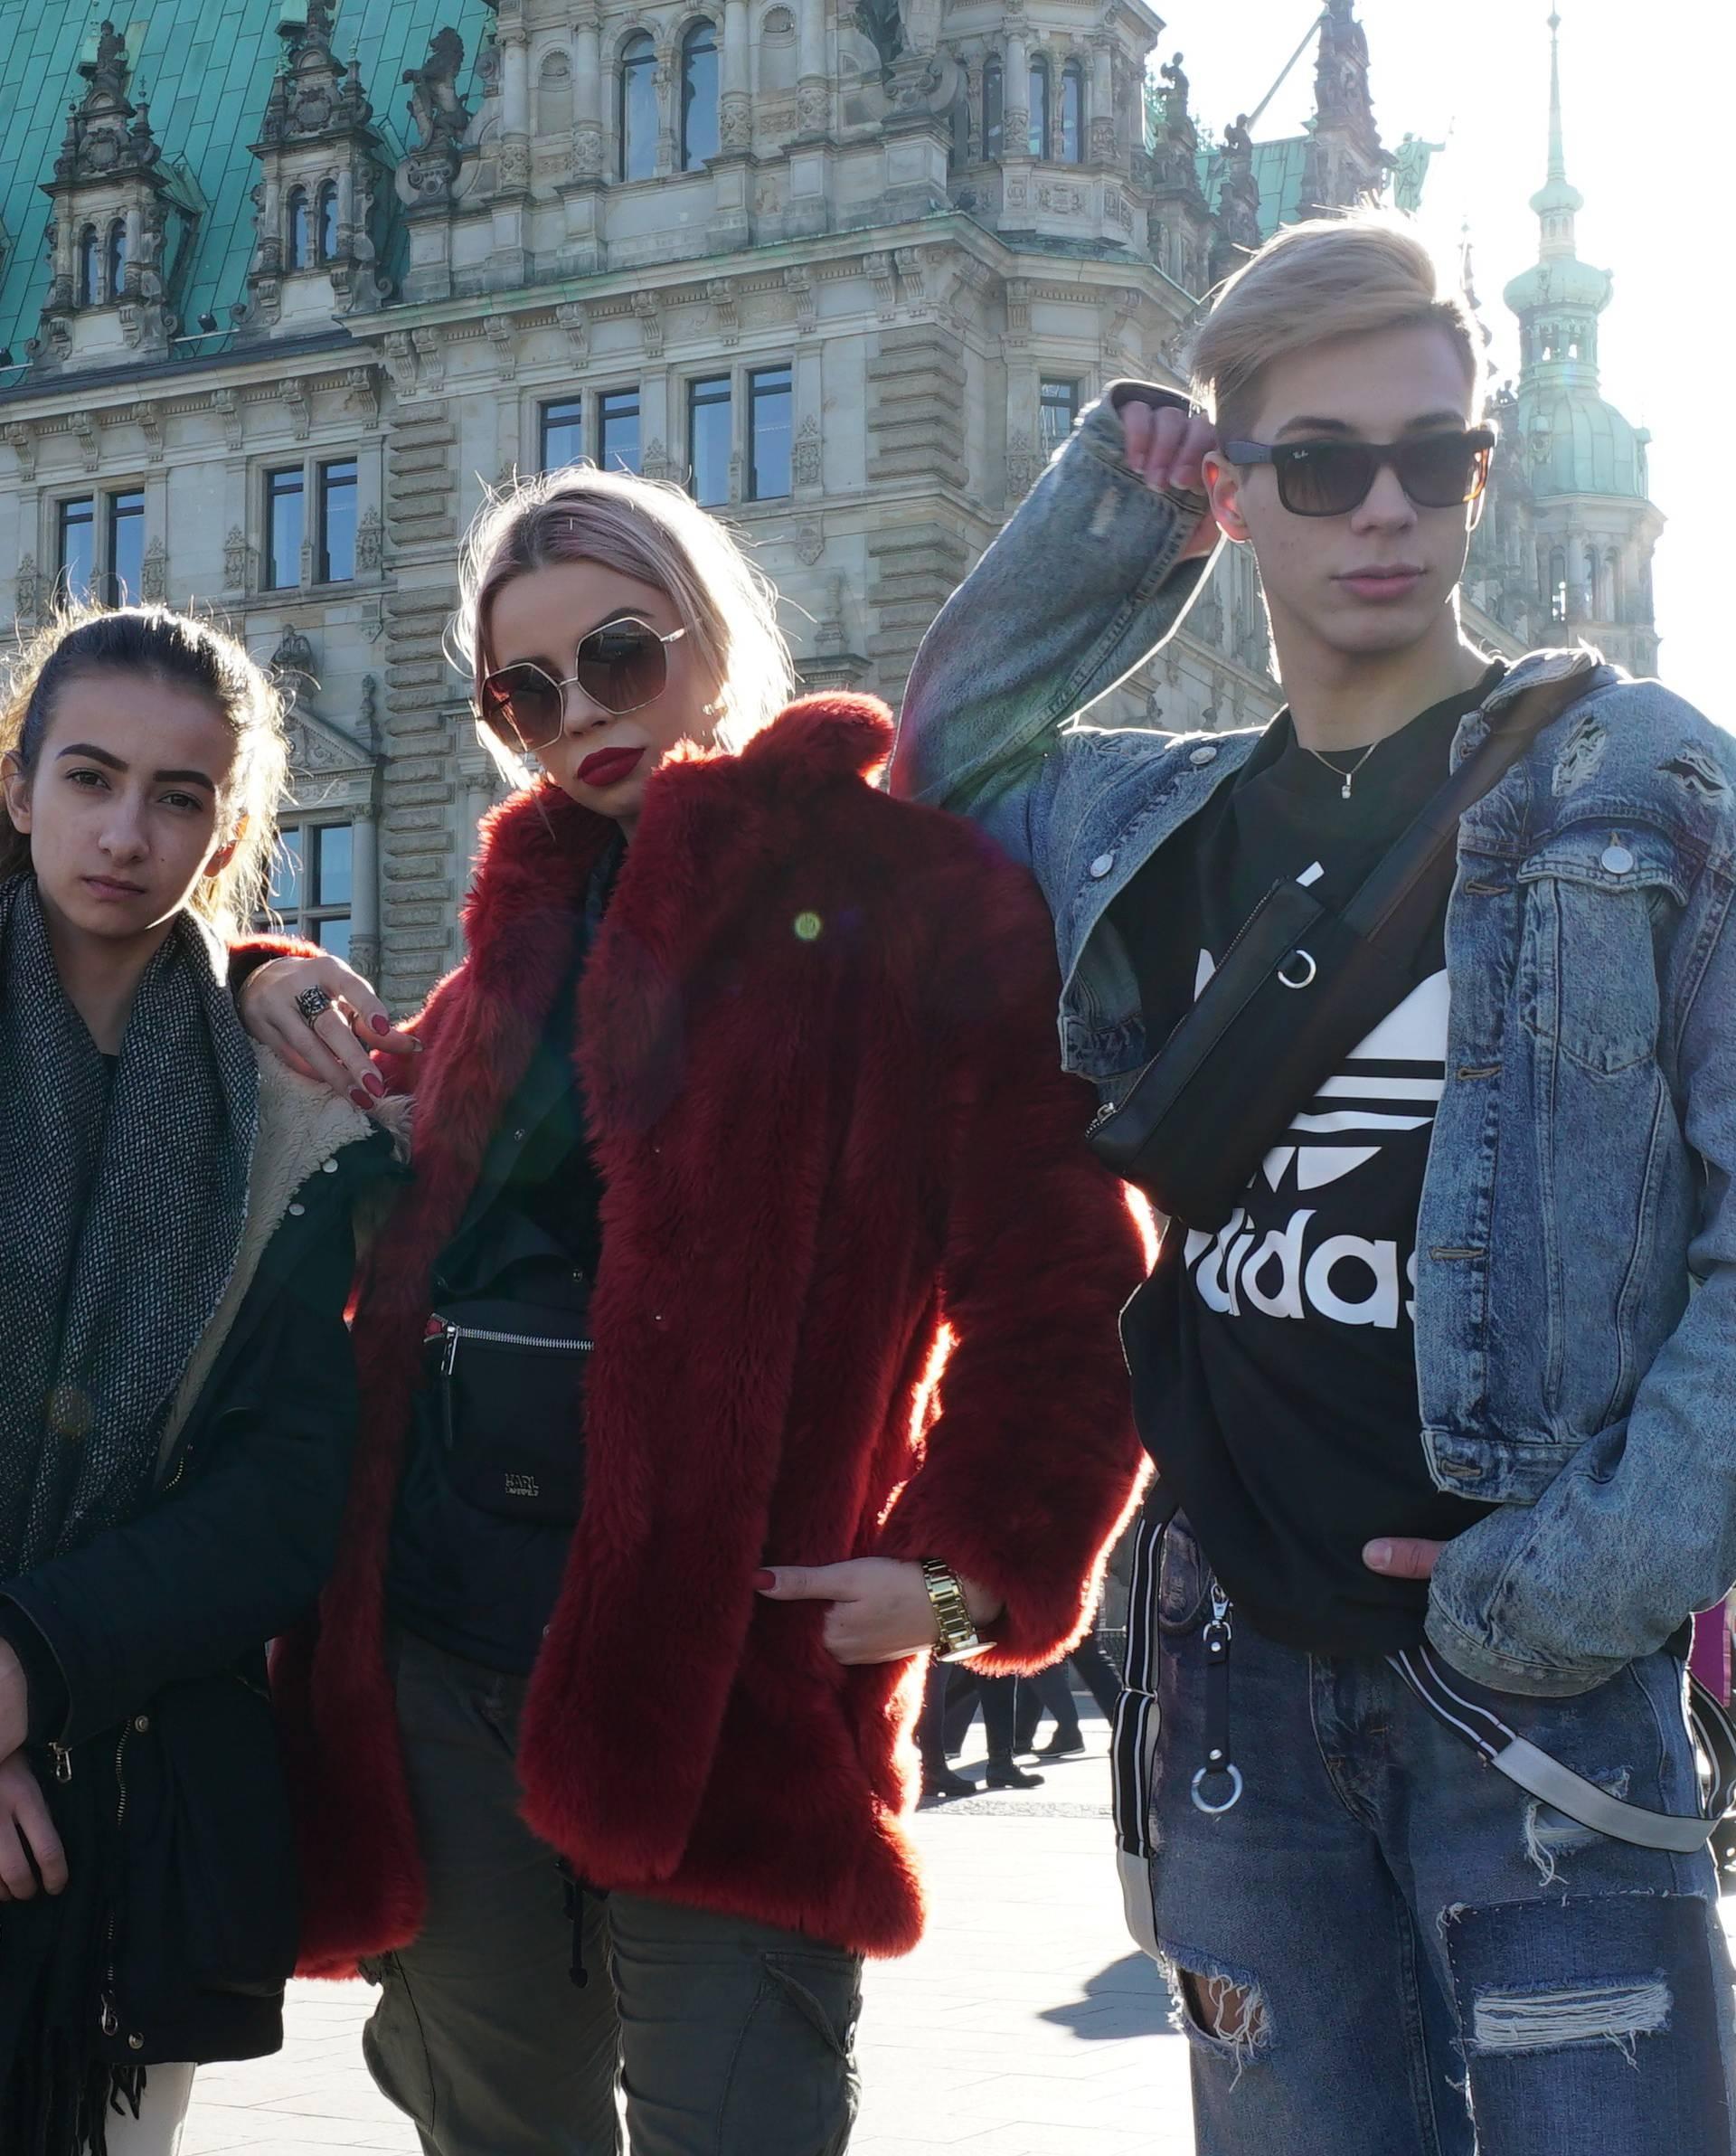 Youtuberica Petra u Hamburgu pjevala Zokijev hit  'Autotune'